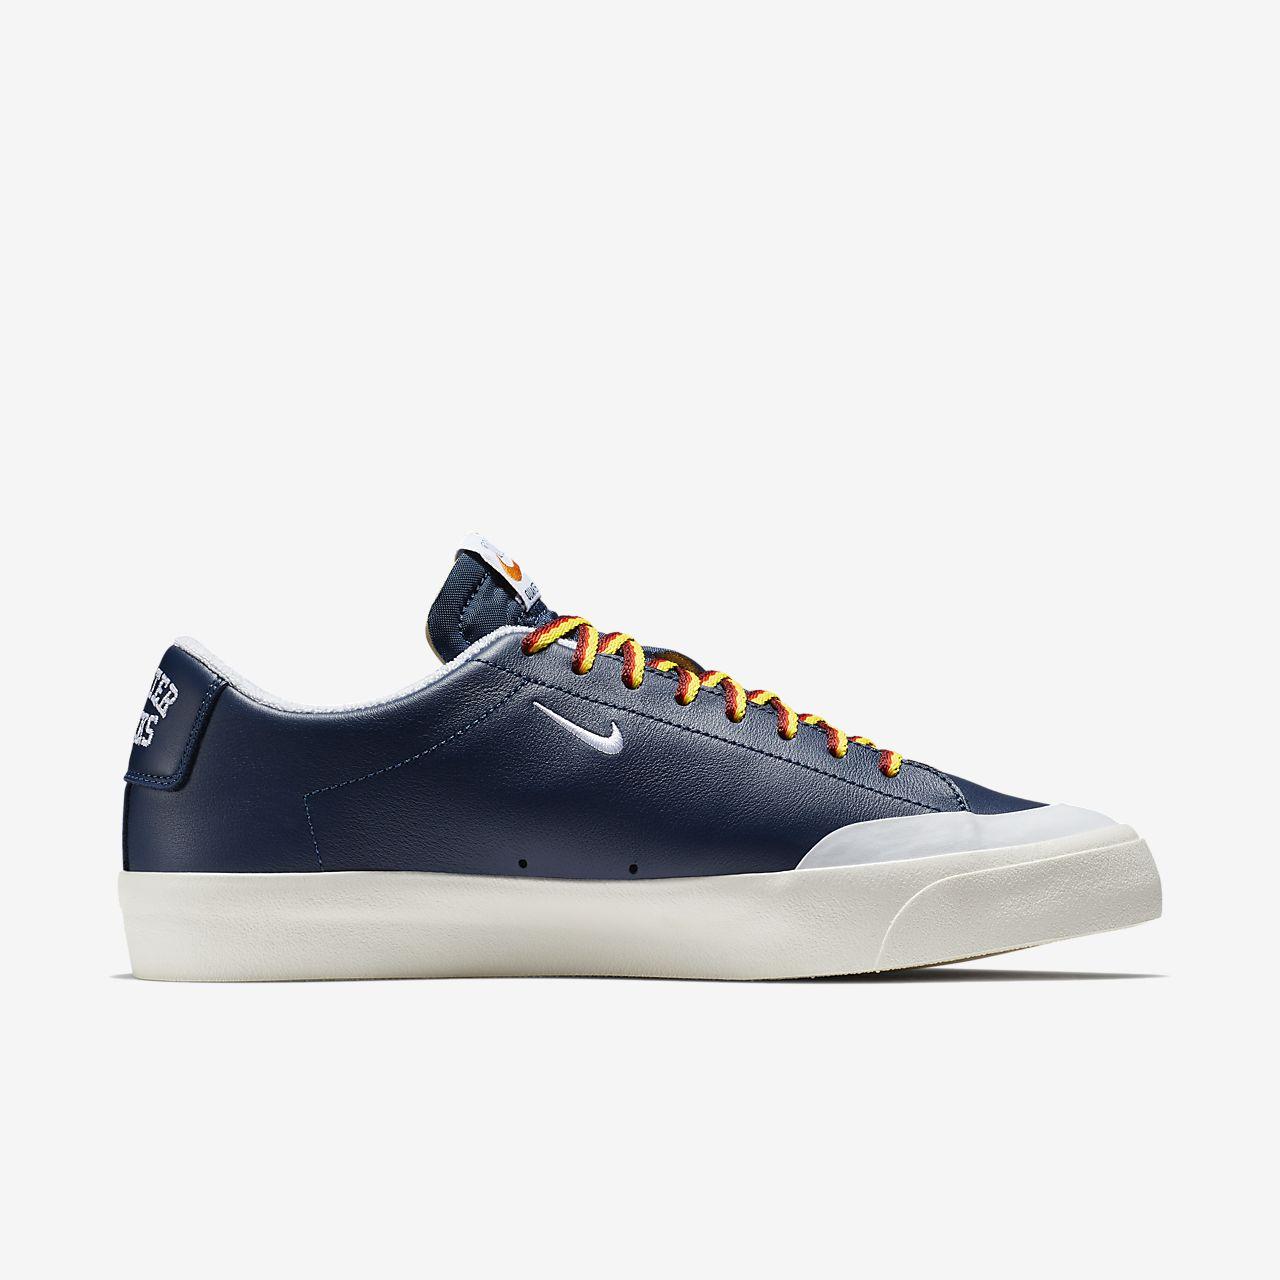 Sapatilhas de skateboard Nike SB Zoom Blazer Low XT QS para homem ... 49641bdb5fe